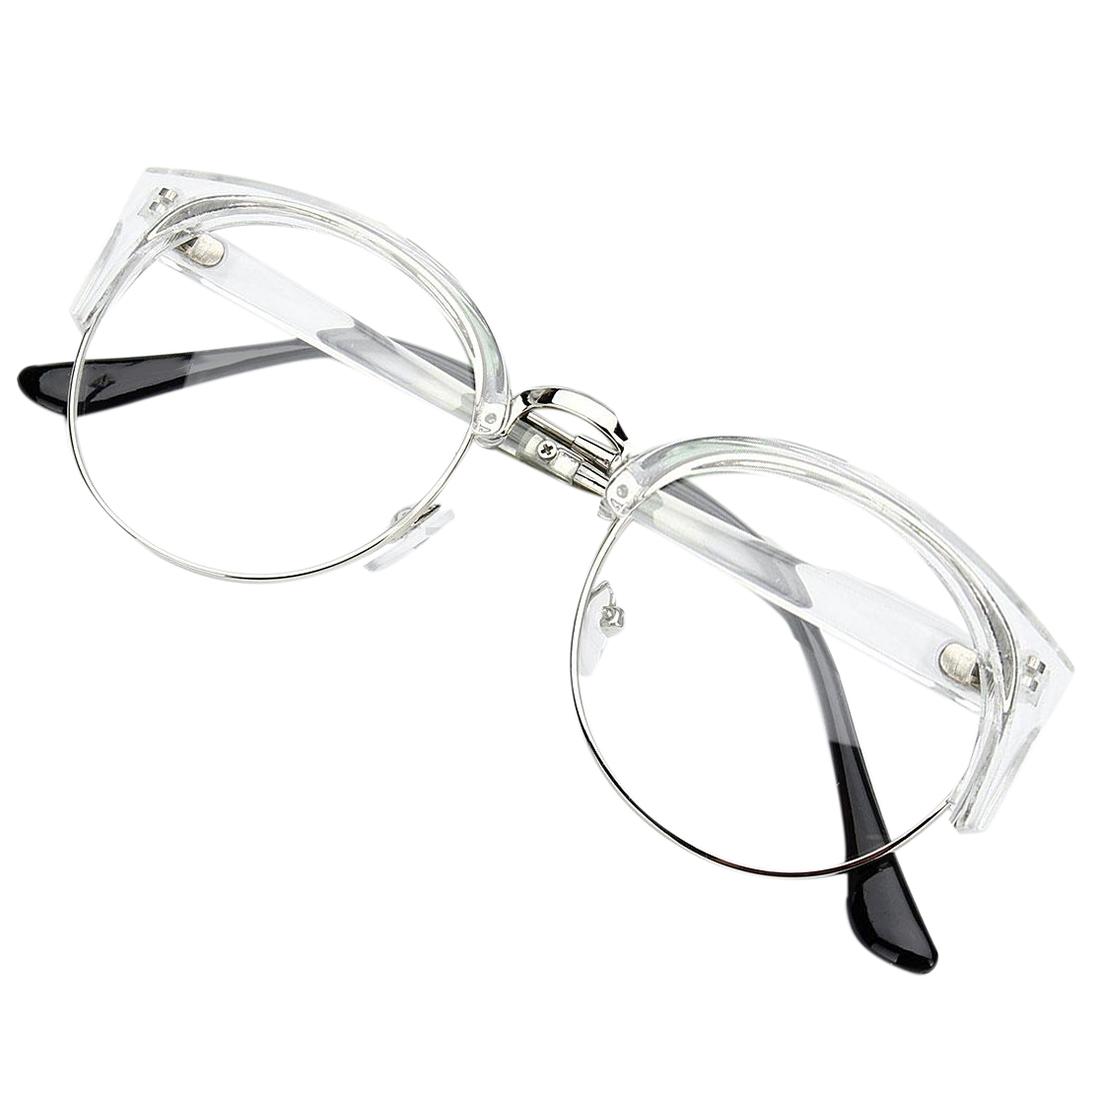 c660e378098ce Wholesale-Retro Style Women Men Round Nerd Glasses Clear Lens Eyewear Metal Frame  Glasses Colors Transparent White+Silver Frame